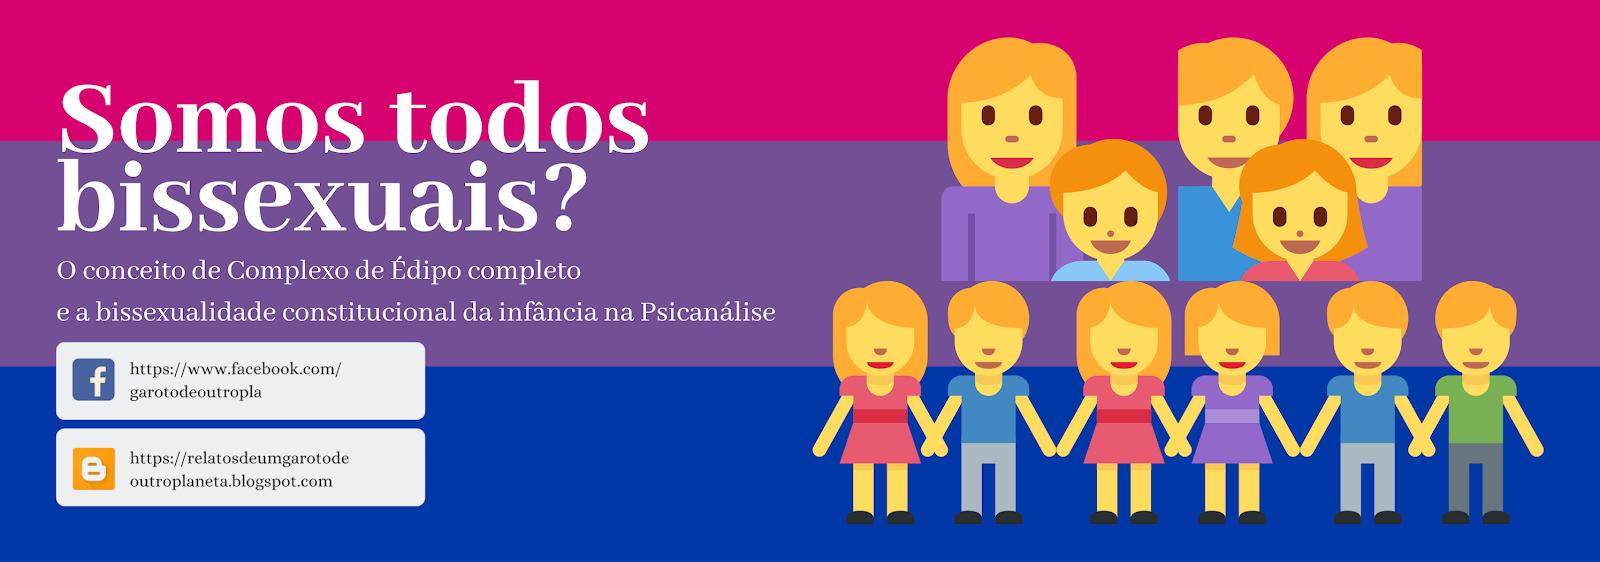 O complexo de Édipo completo e a bissexualidade constitucional da infância na Psicanálise.